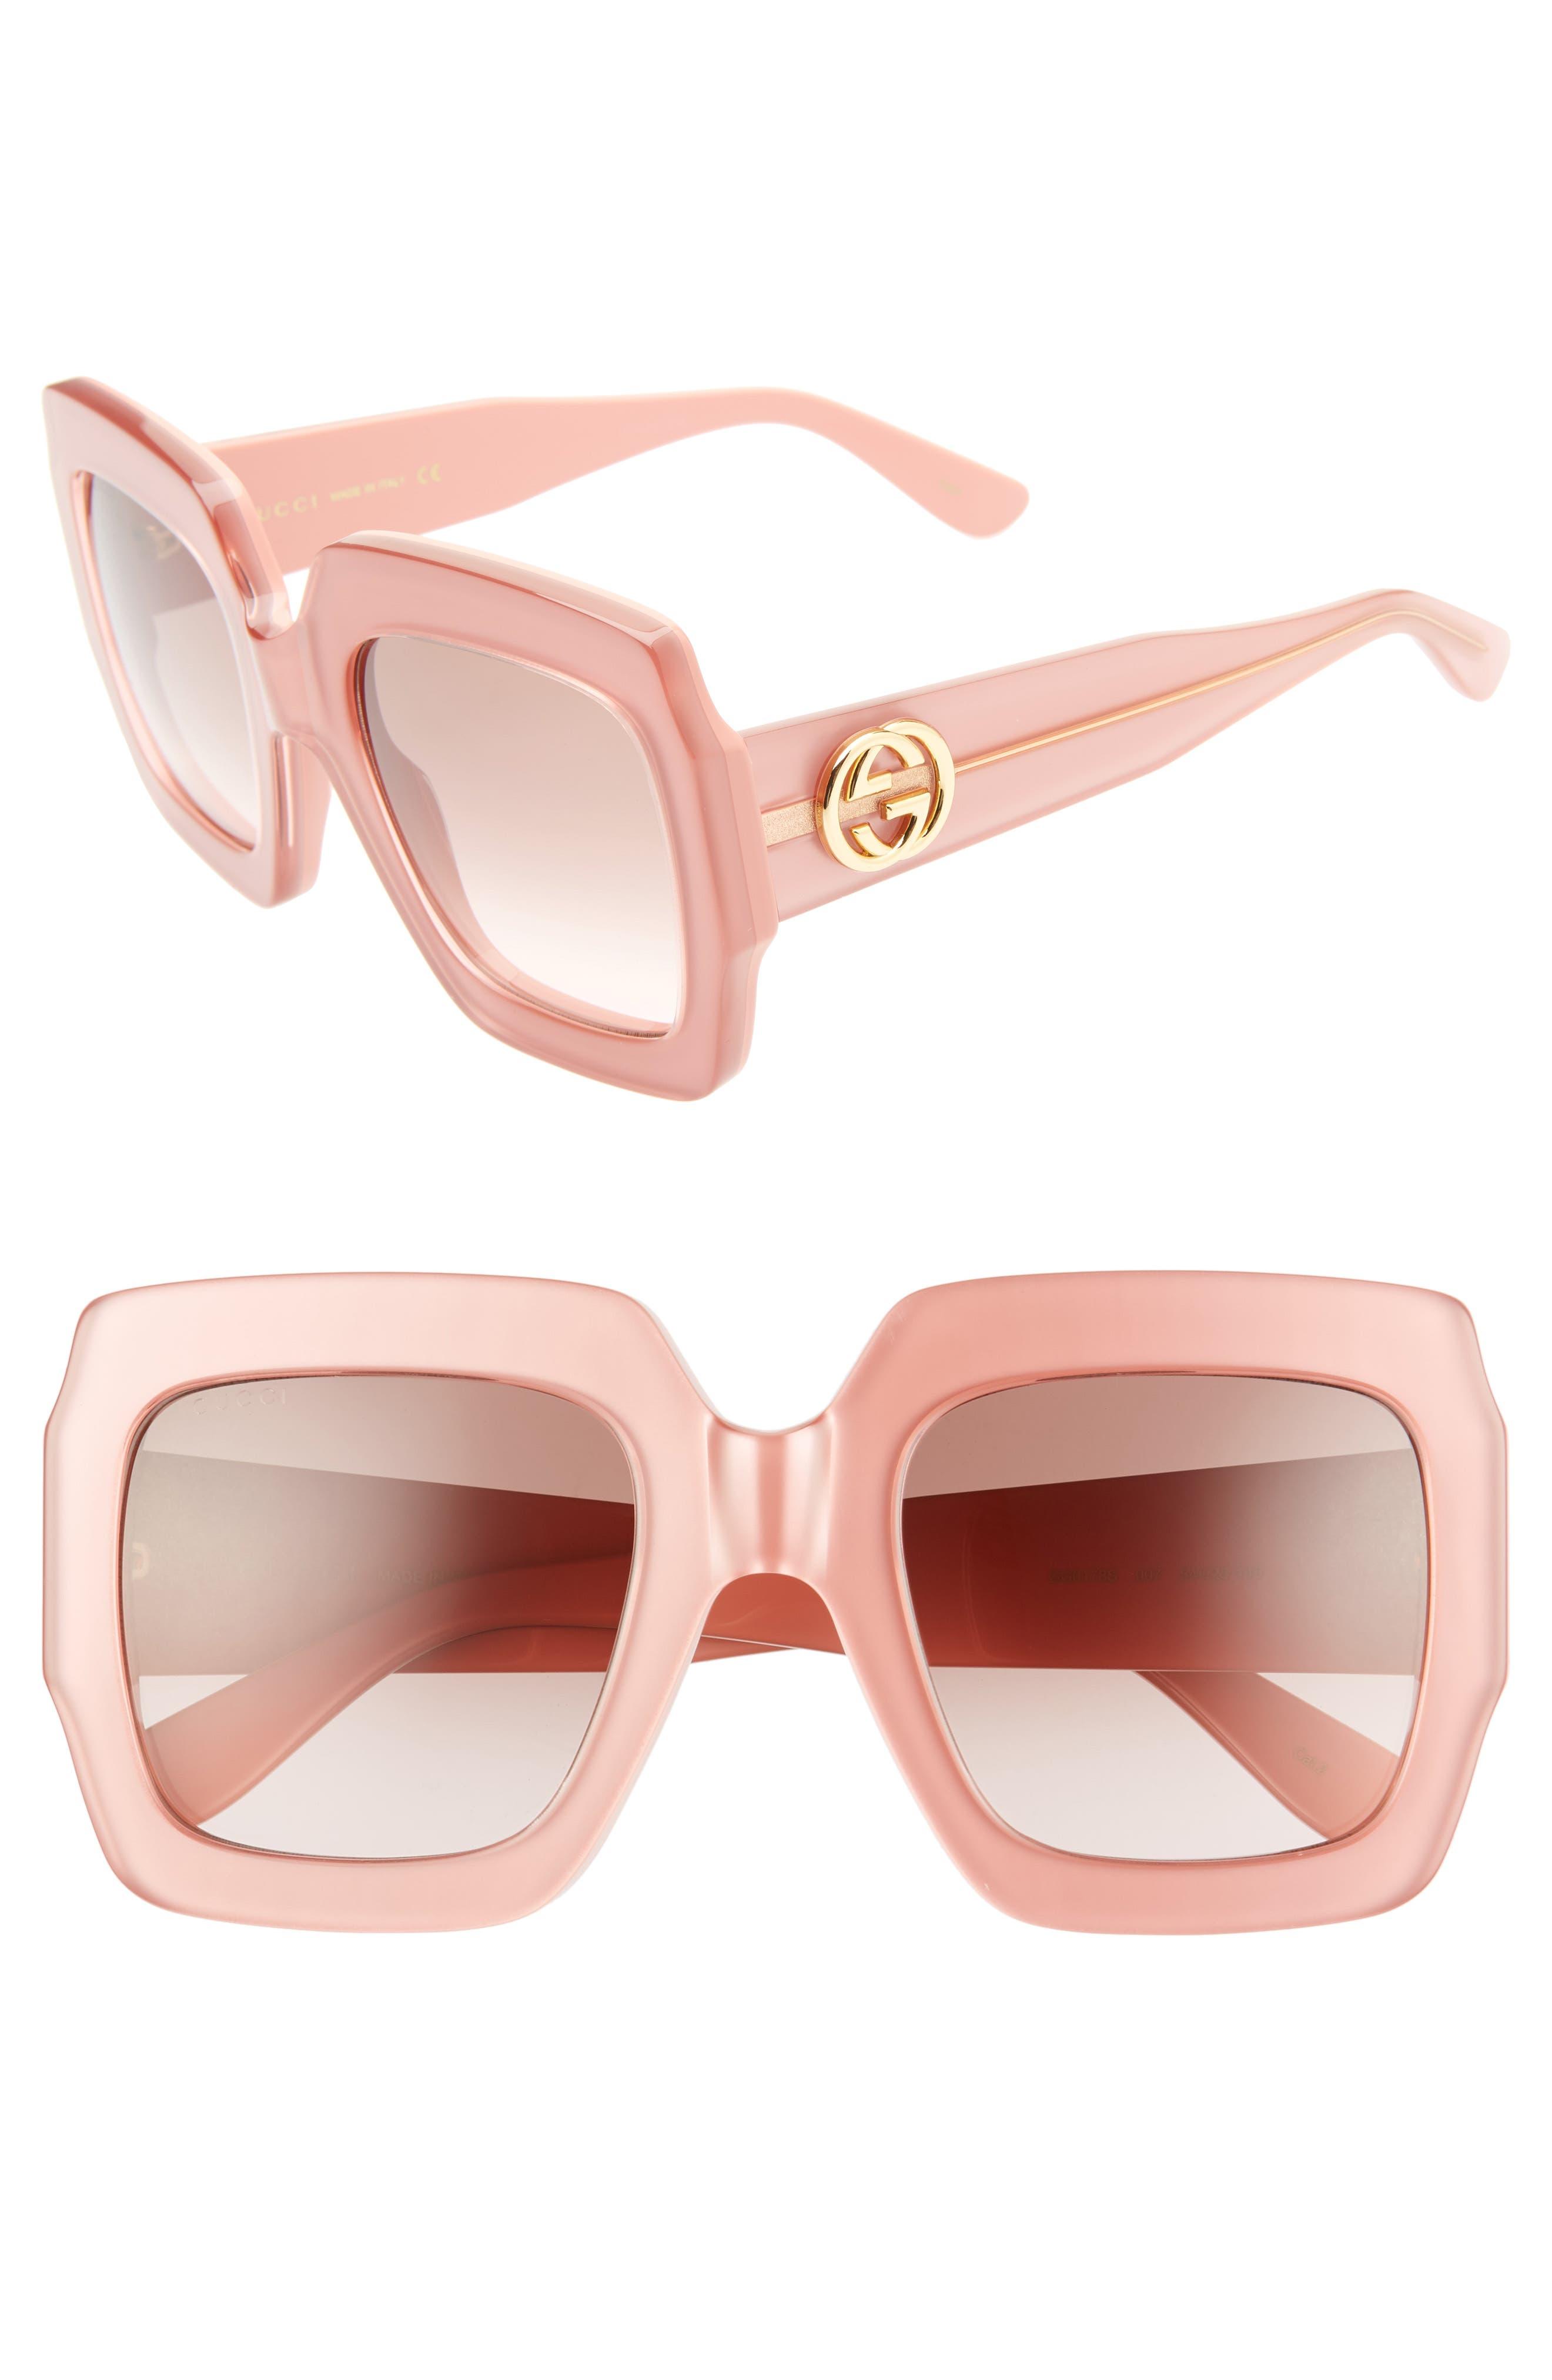 GUCCI, 54mm Square Sunglasses, Main thumbnail 1, color, SHNY MULTLAY GLOSS ROSE/BRN